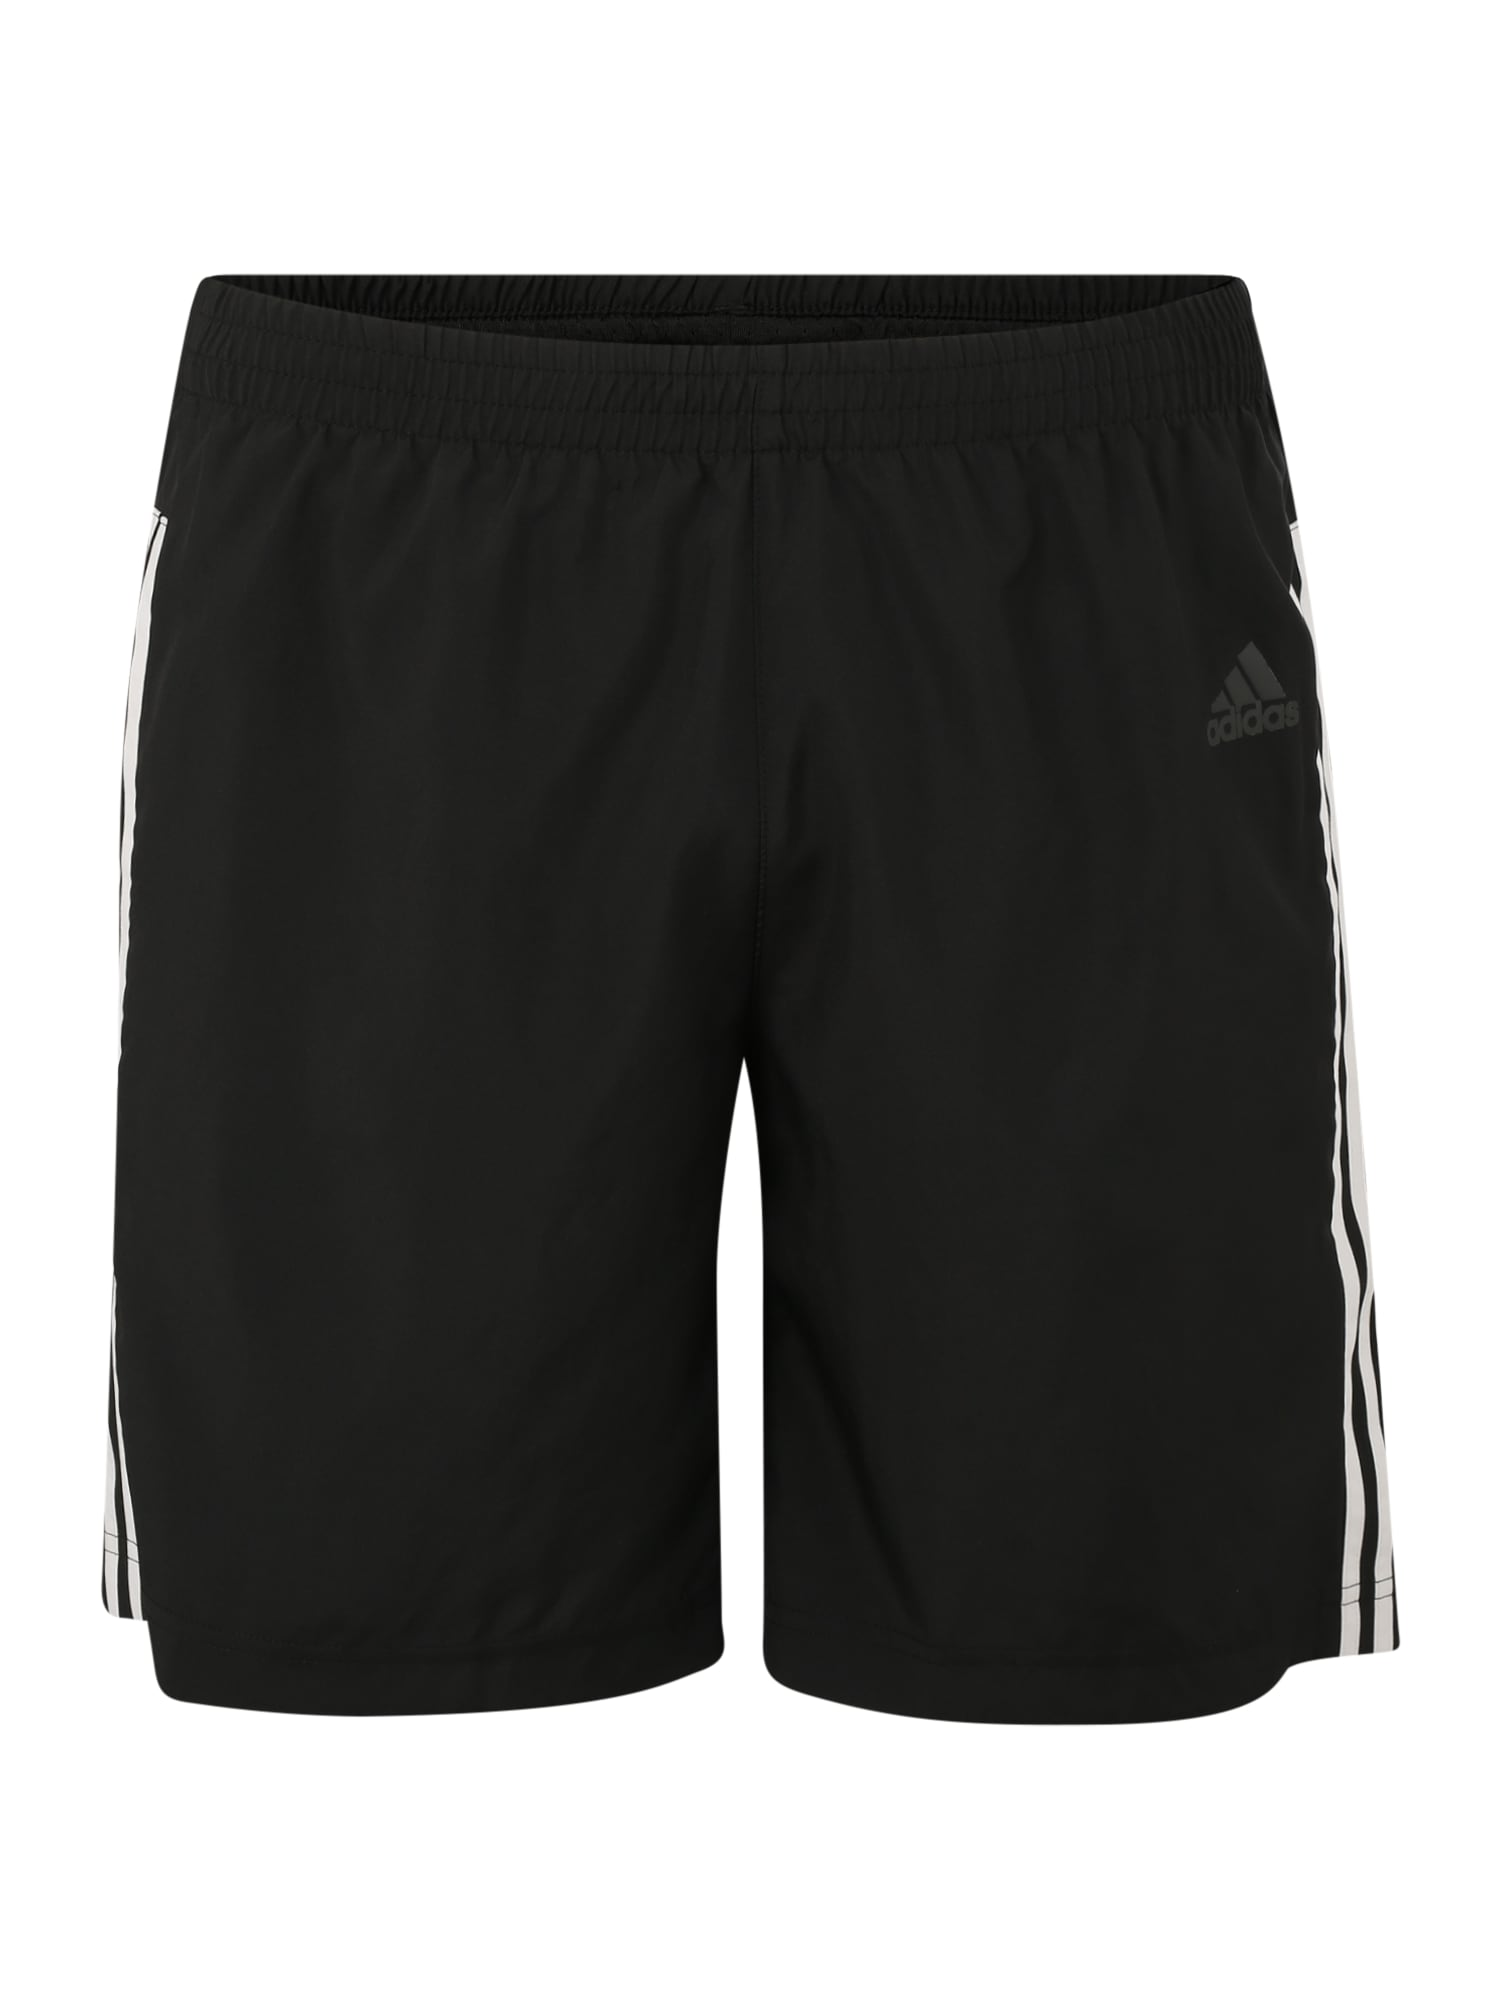 ADIDAS PERFORMANCE Športové nohavice 'RUN IT'  biela / čierna